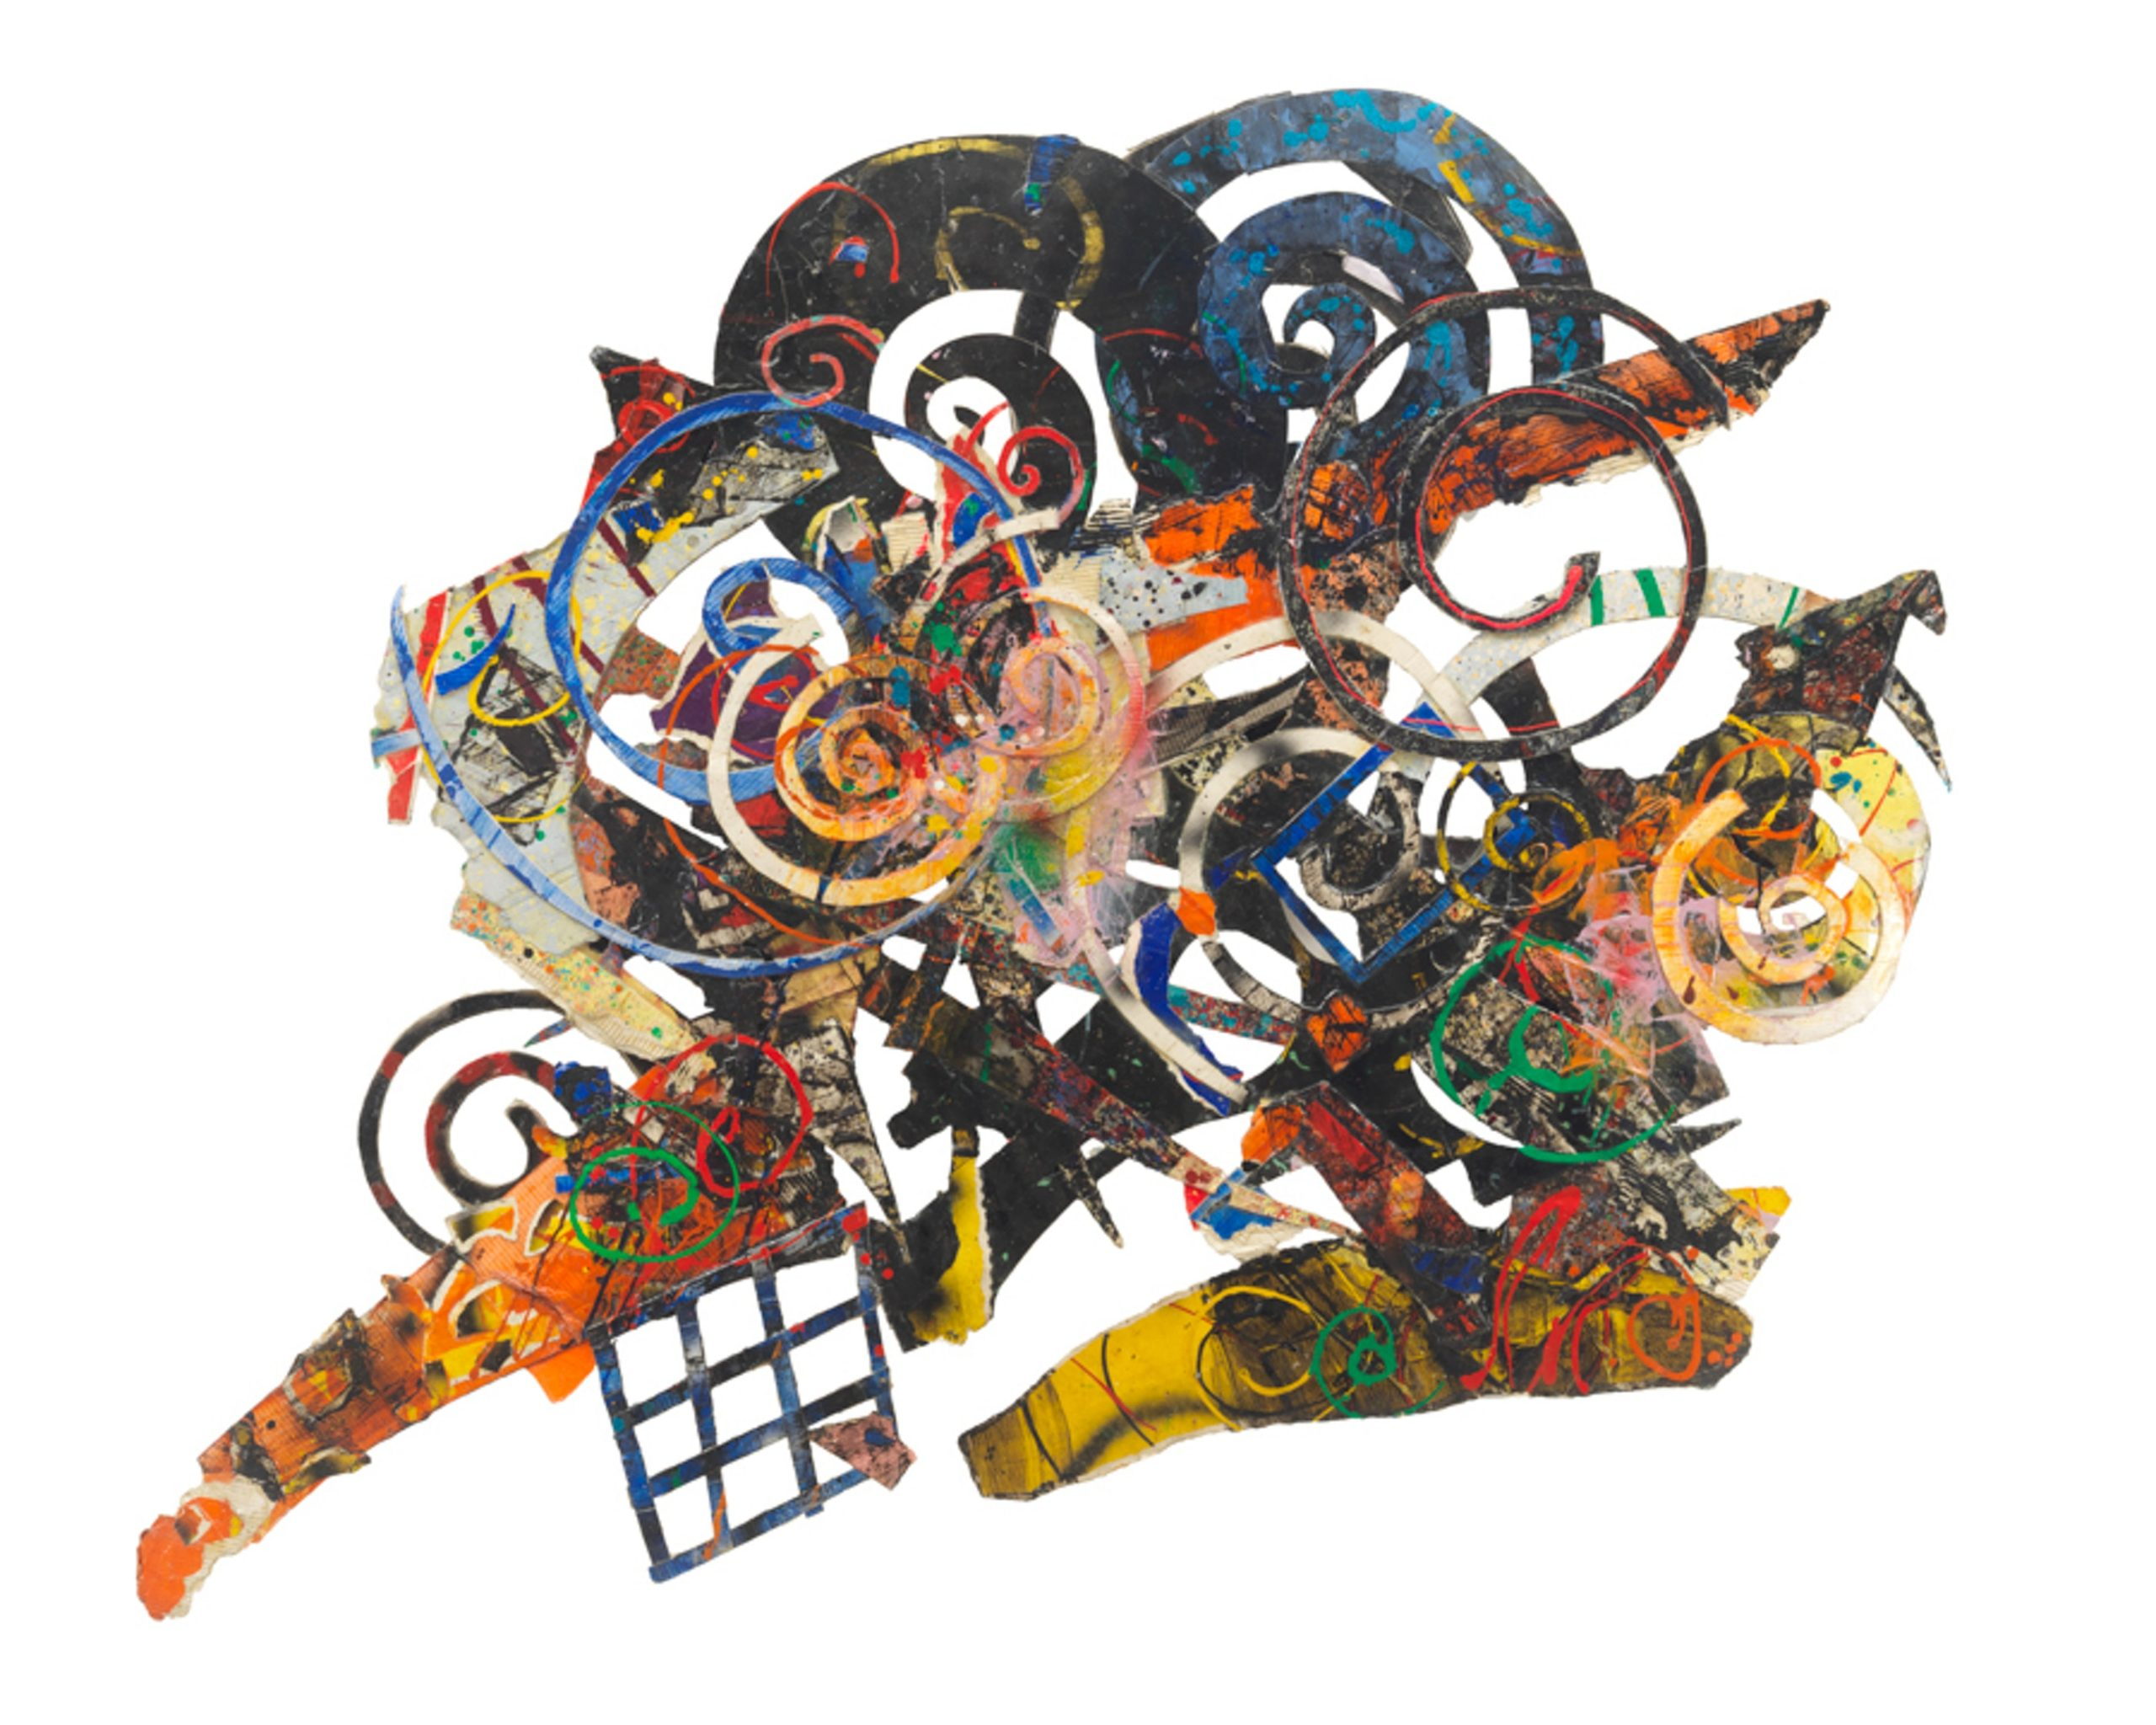 "Al Loving, Humbird, 1989, mixed media on board, 72"" x 100"". Courtesy the Estate of Al Loving and Garth Greenan Gallery, New York."